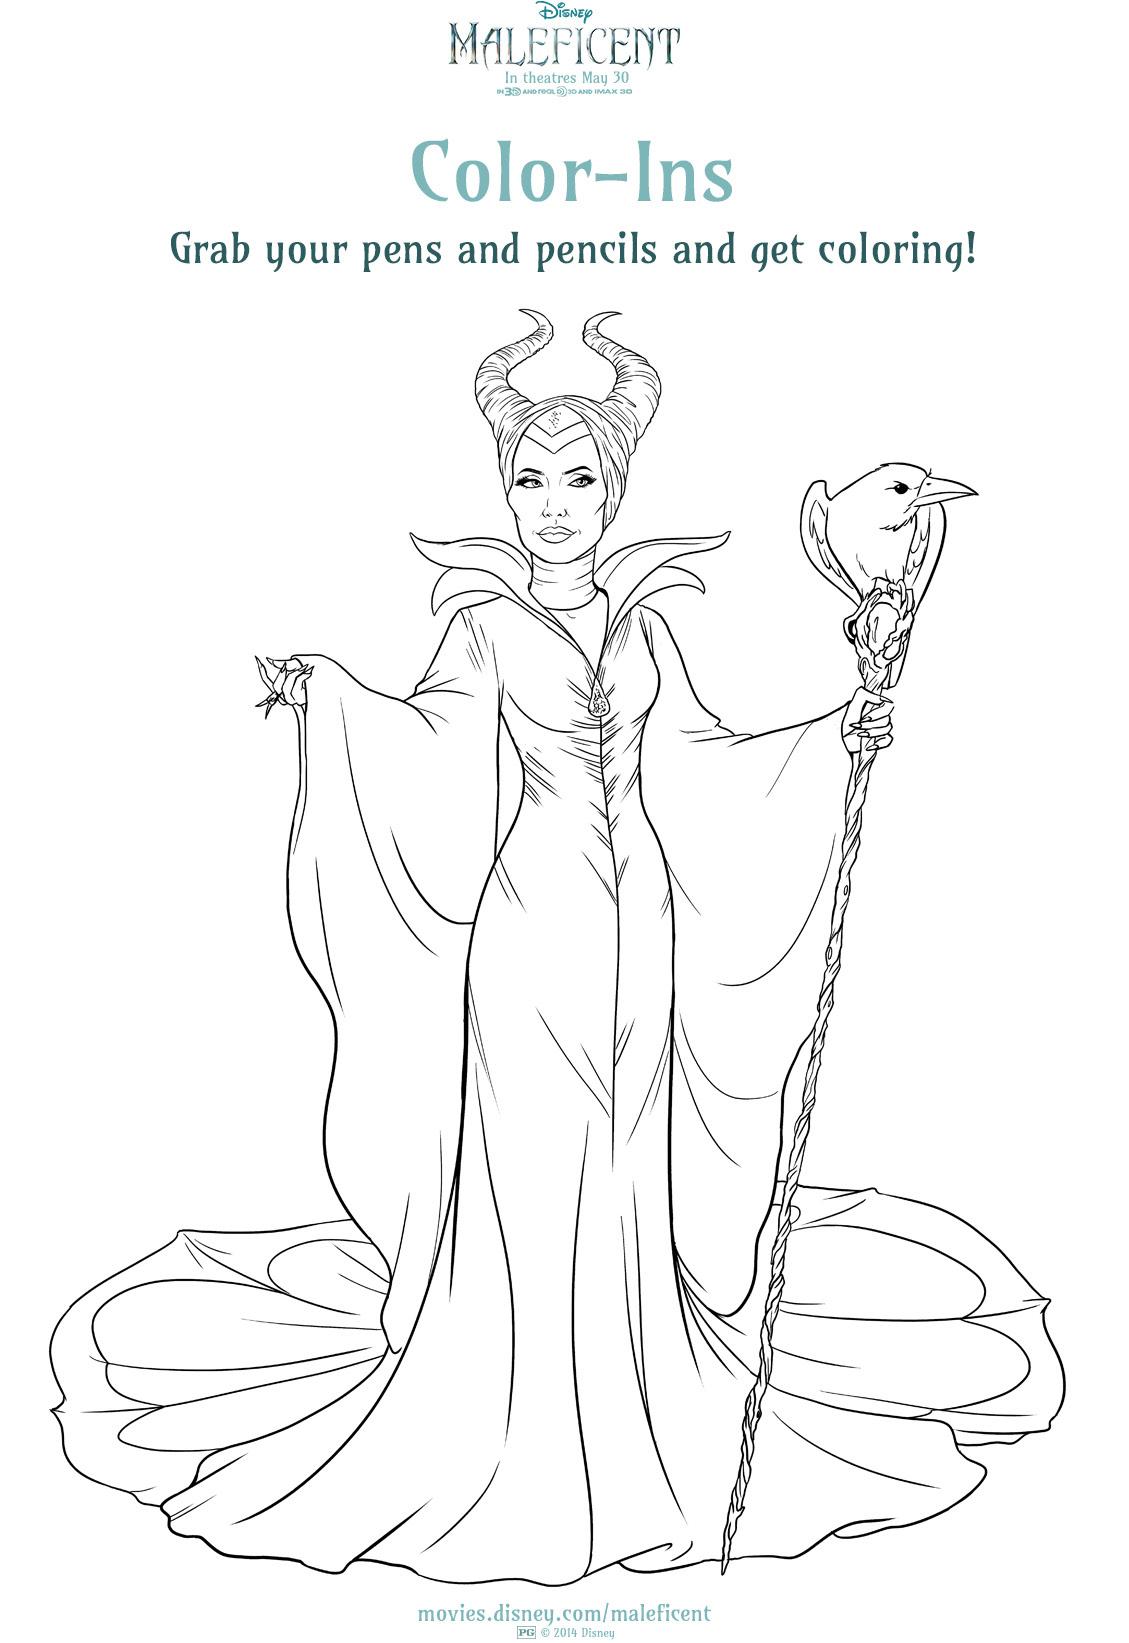 Image - Maleficent Colour ins 1.jpg | Disney Wiki | FANDOM powered ...